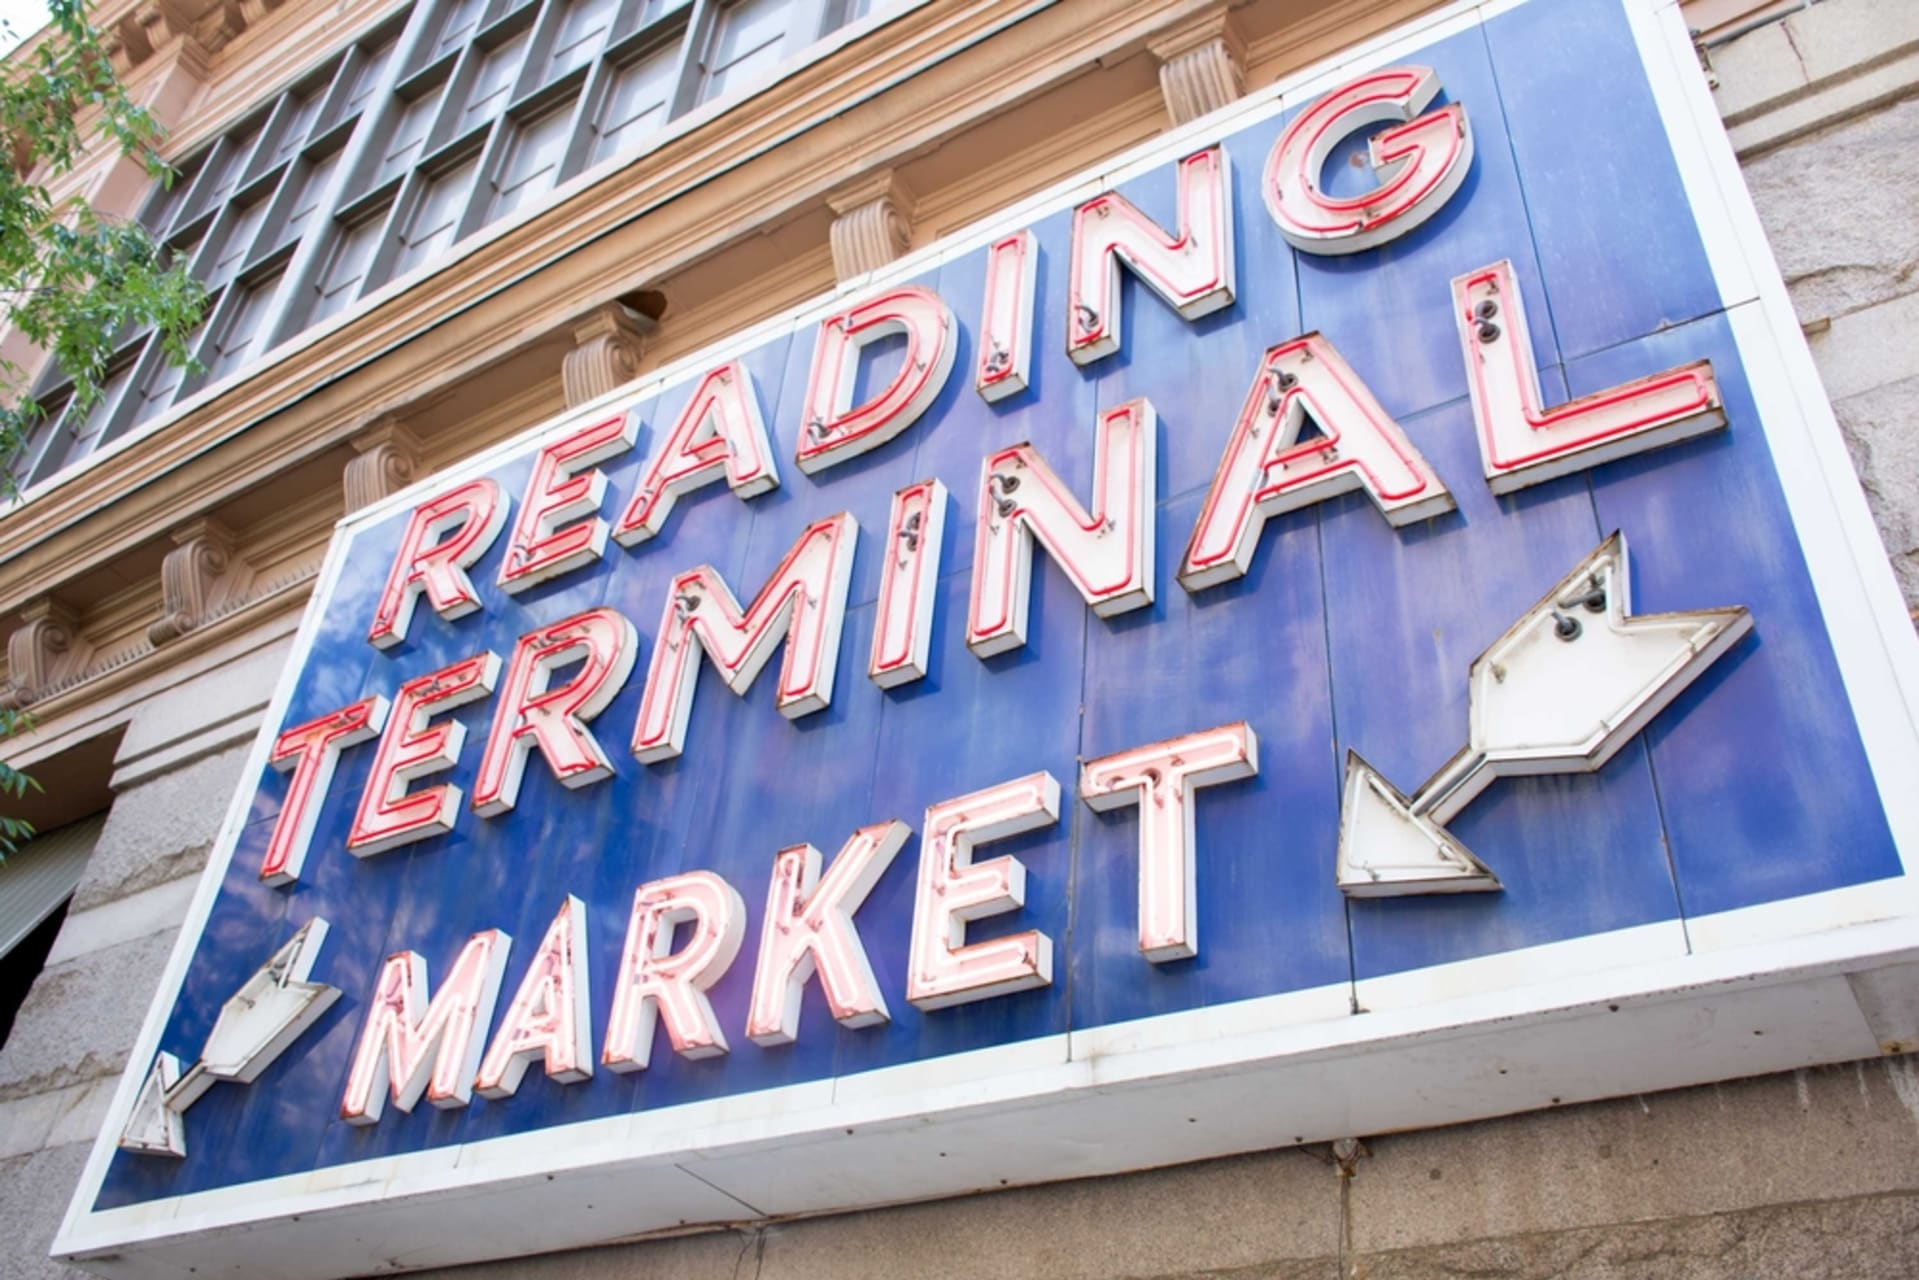 Philadelphia - Center City and Reading Terminal Market